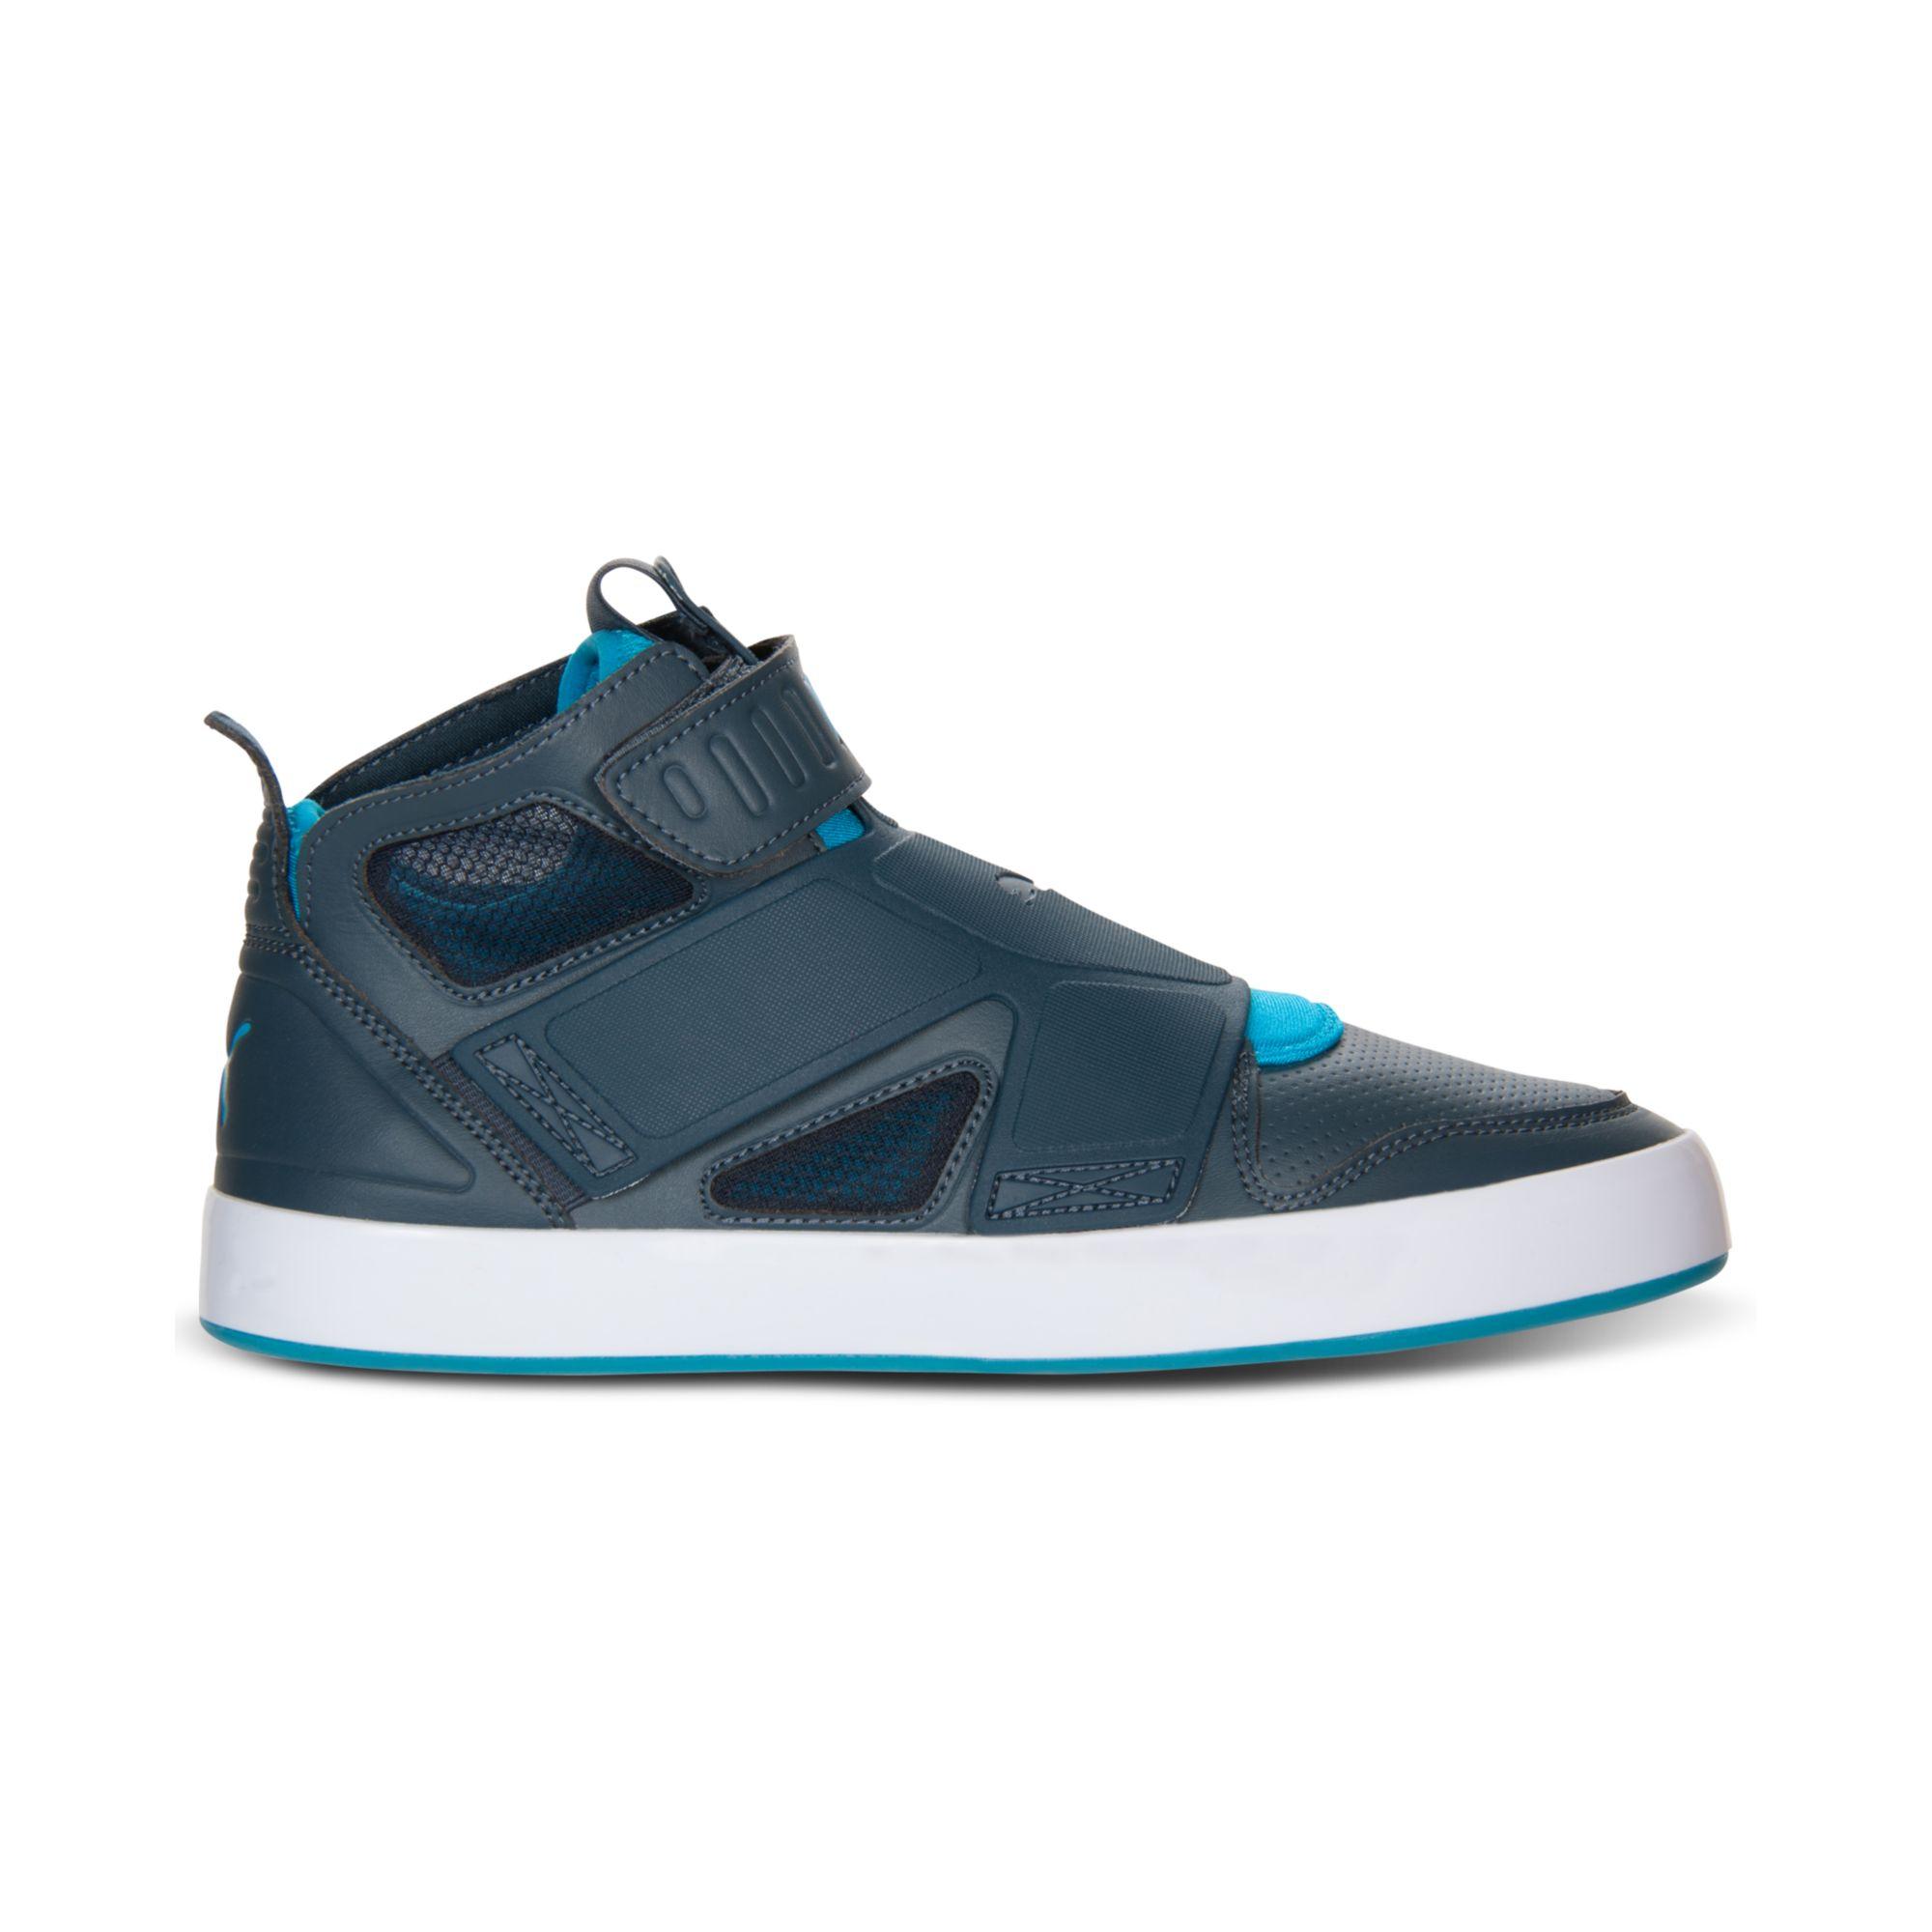 date de sortie 3922a 60af3 PUMA White El Rey Future High Top Sneakers for men